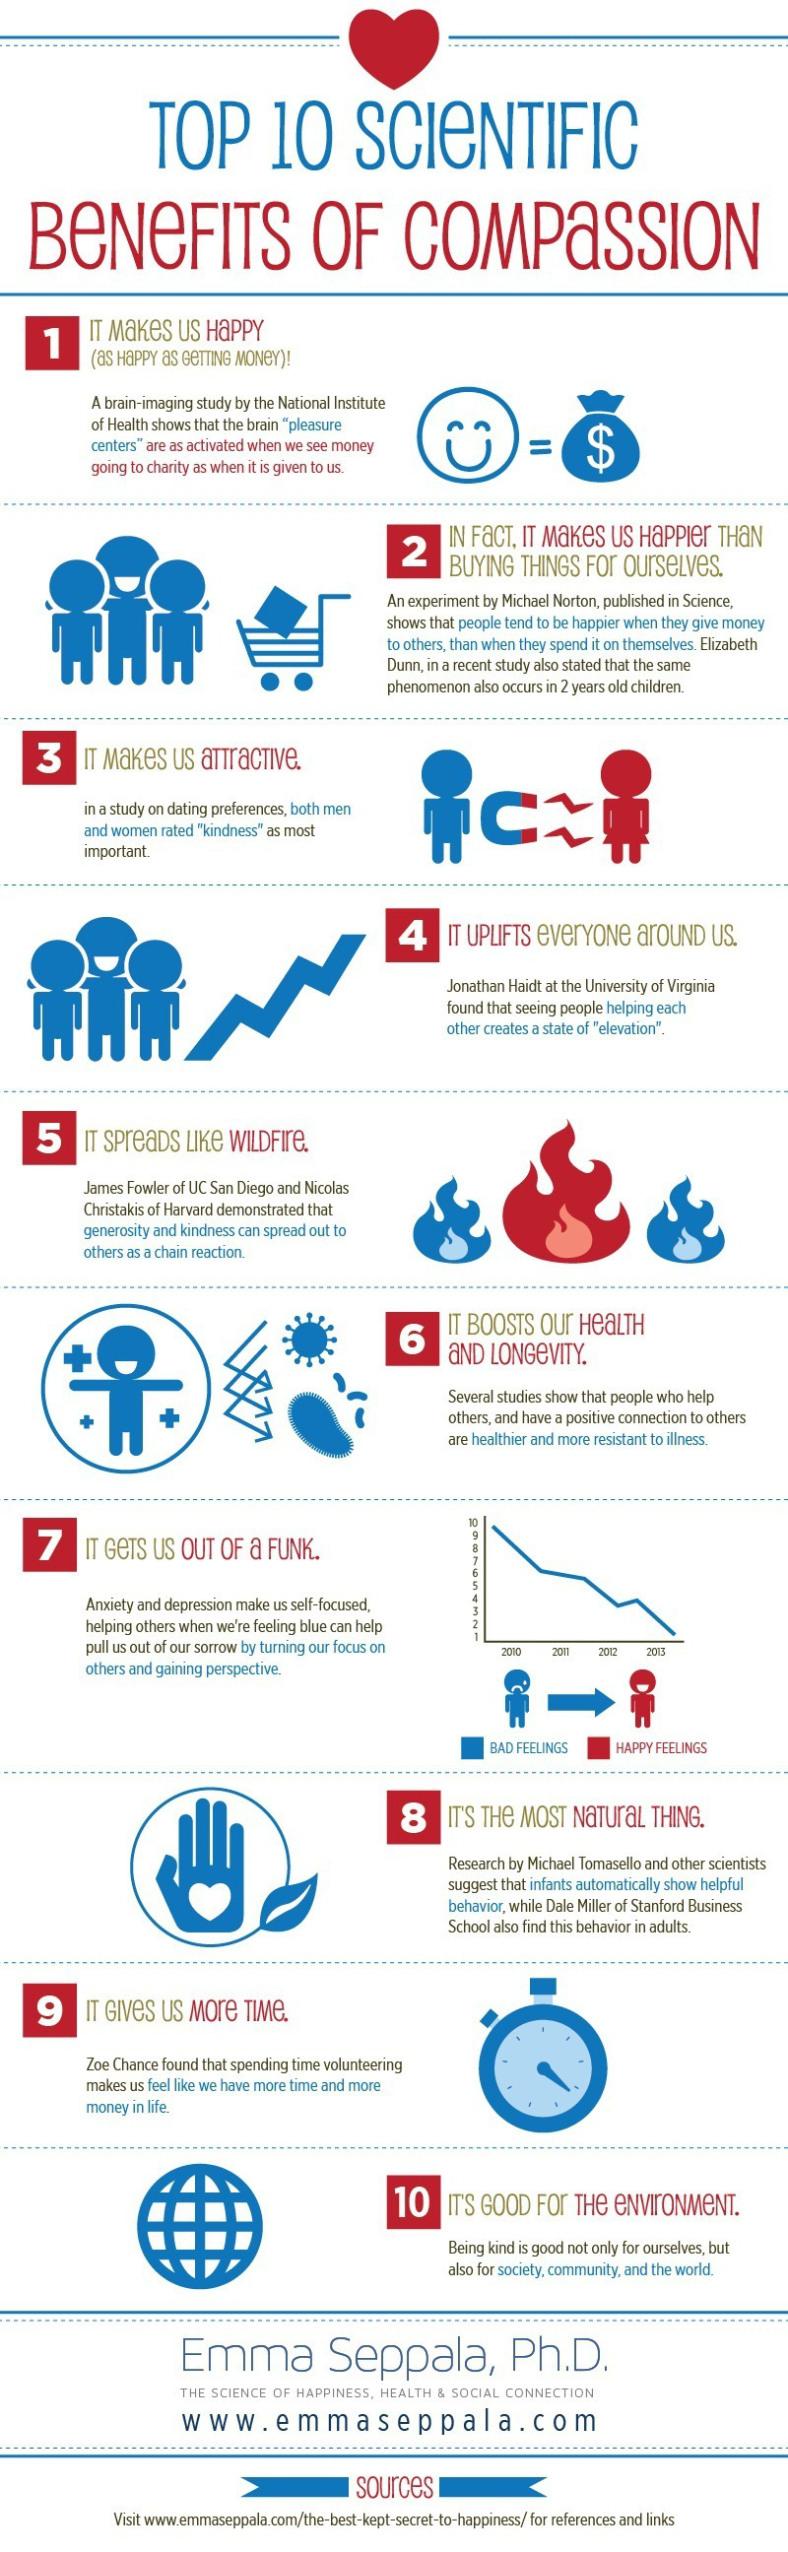 Top 10 Scientific Benefits of Compassion